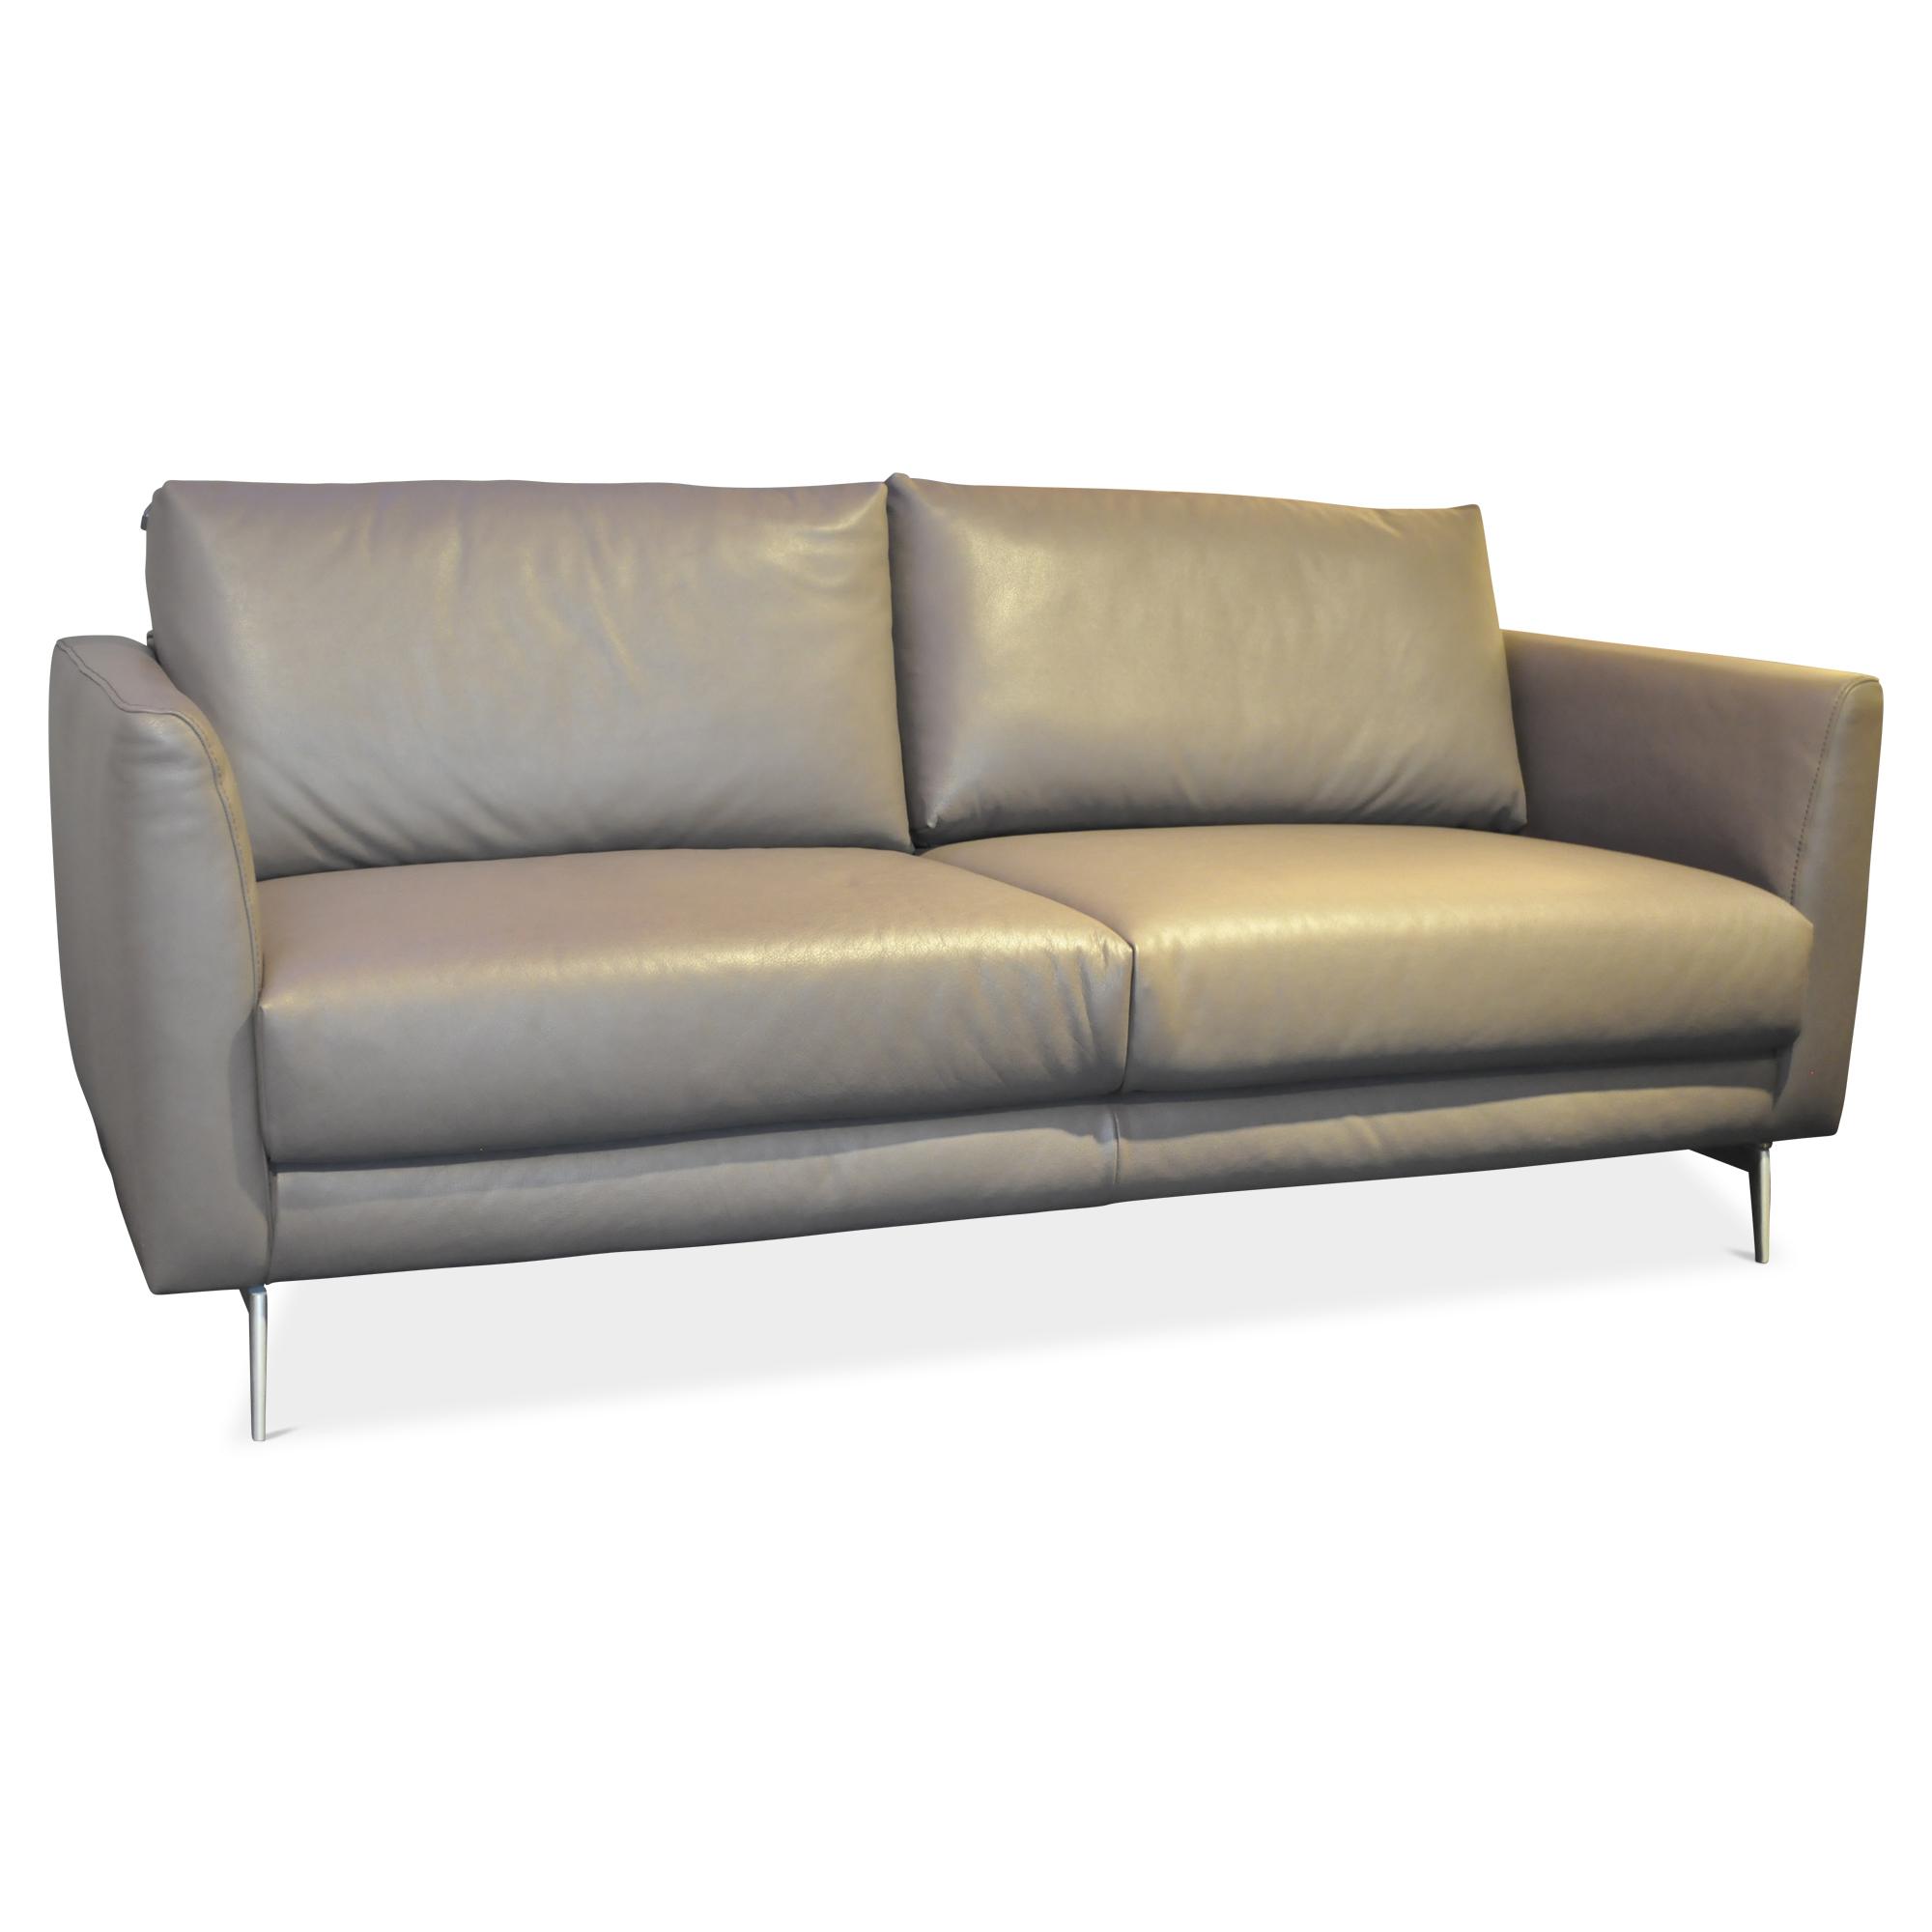 Sofa Omega – Koinor – Sofas – günstig kaufen